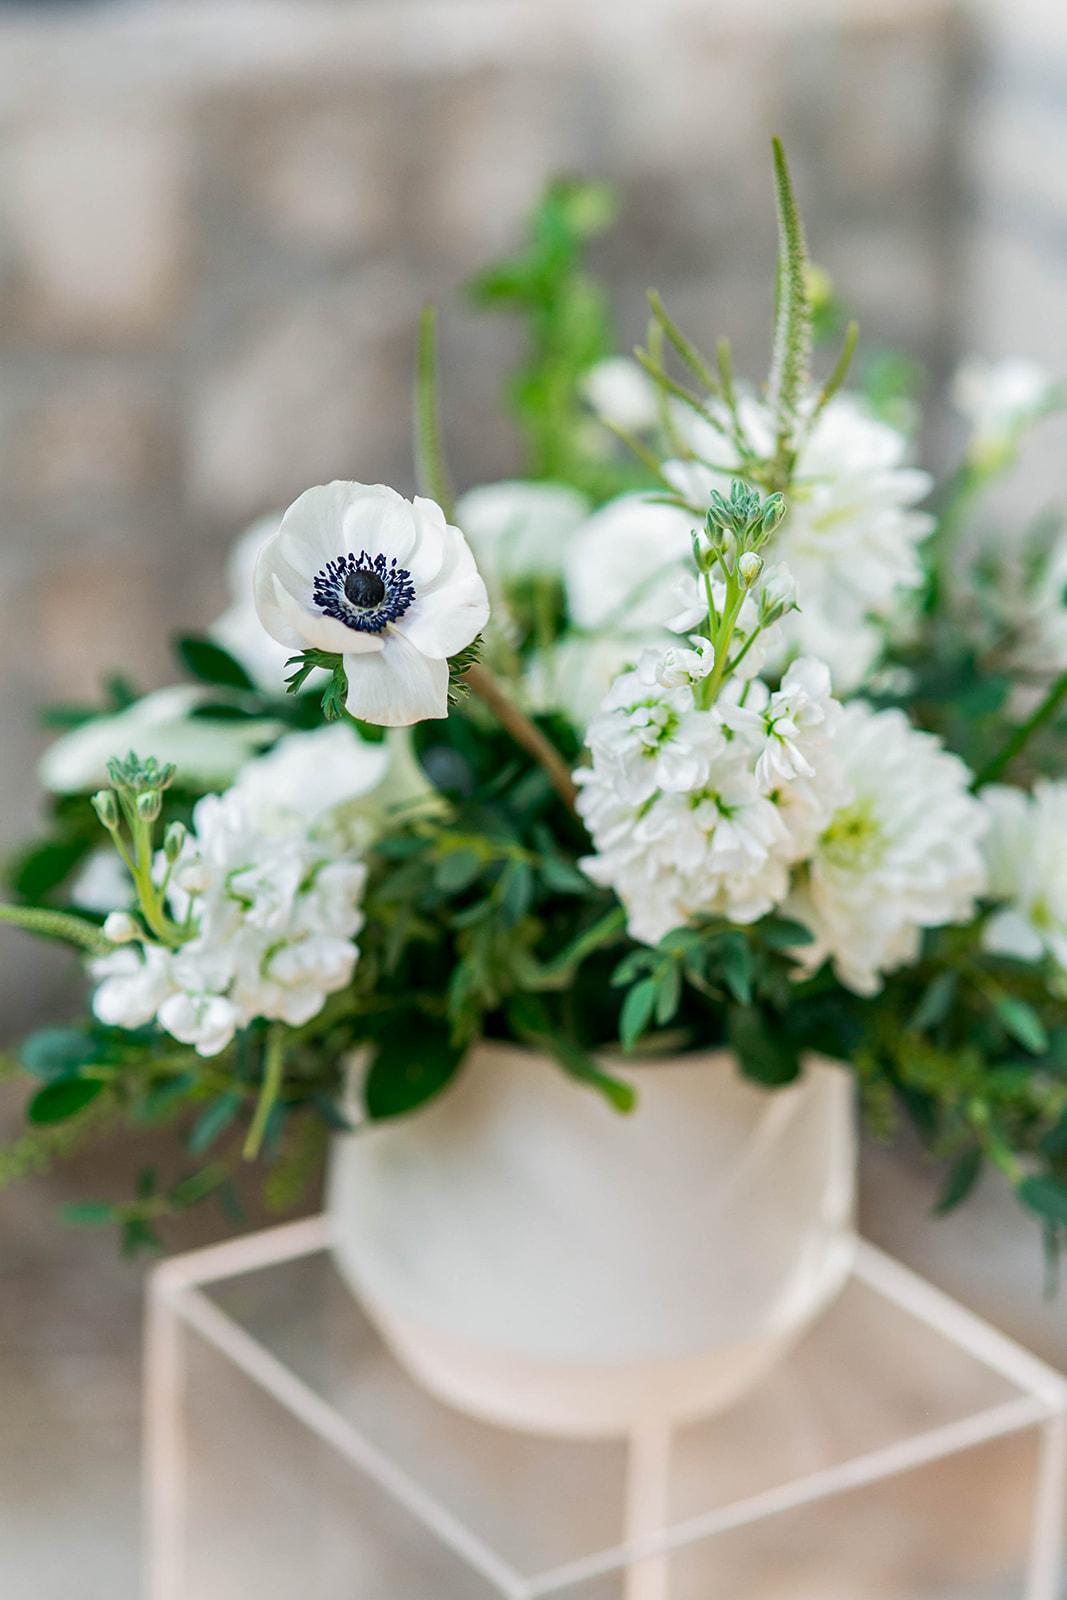 Flower arrangement at an intimate outdoor wedding at Auberge du Pommier in Toronto